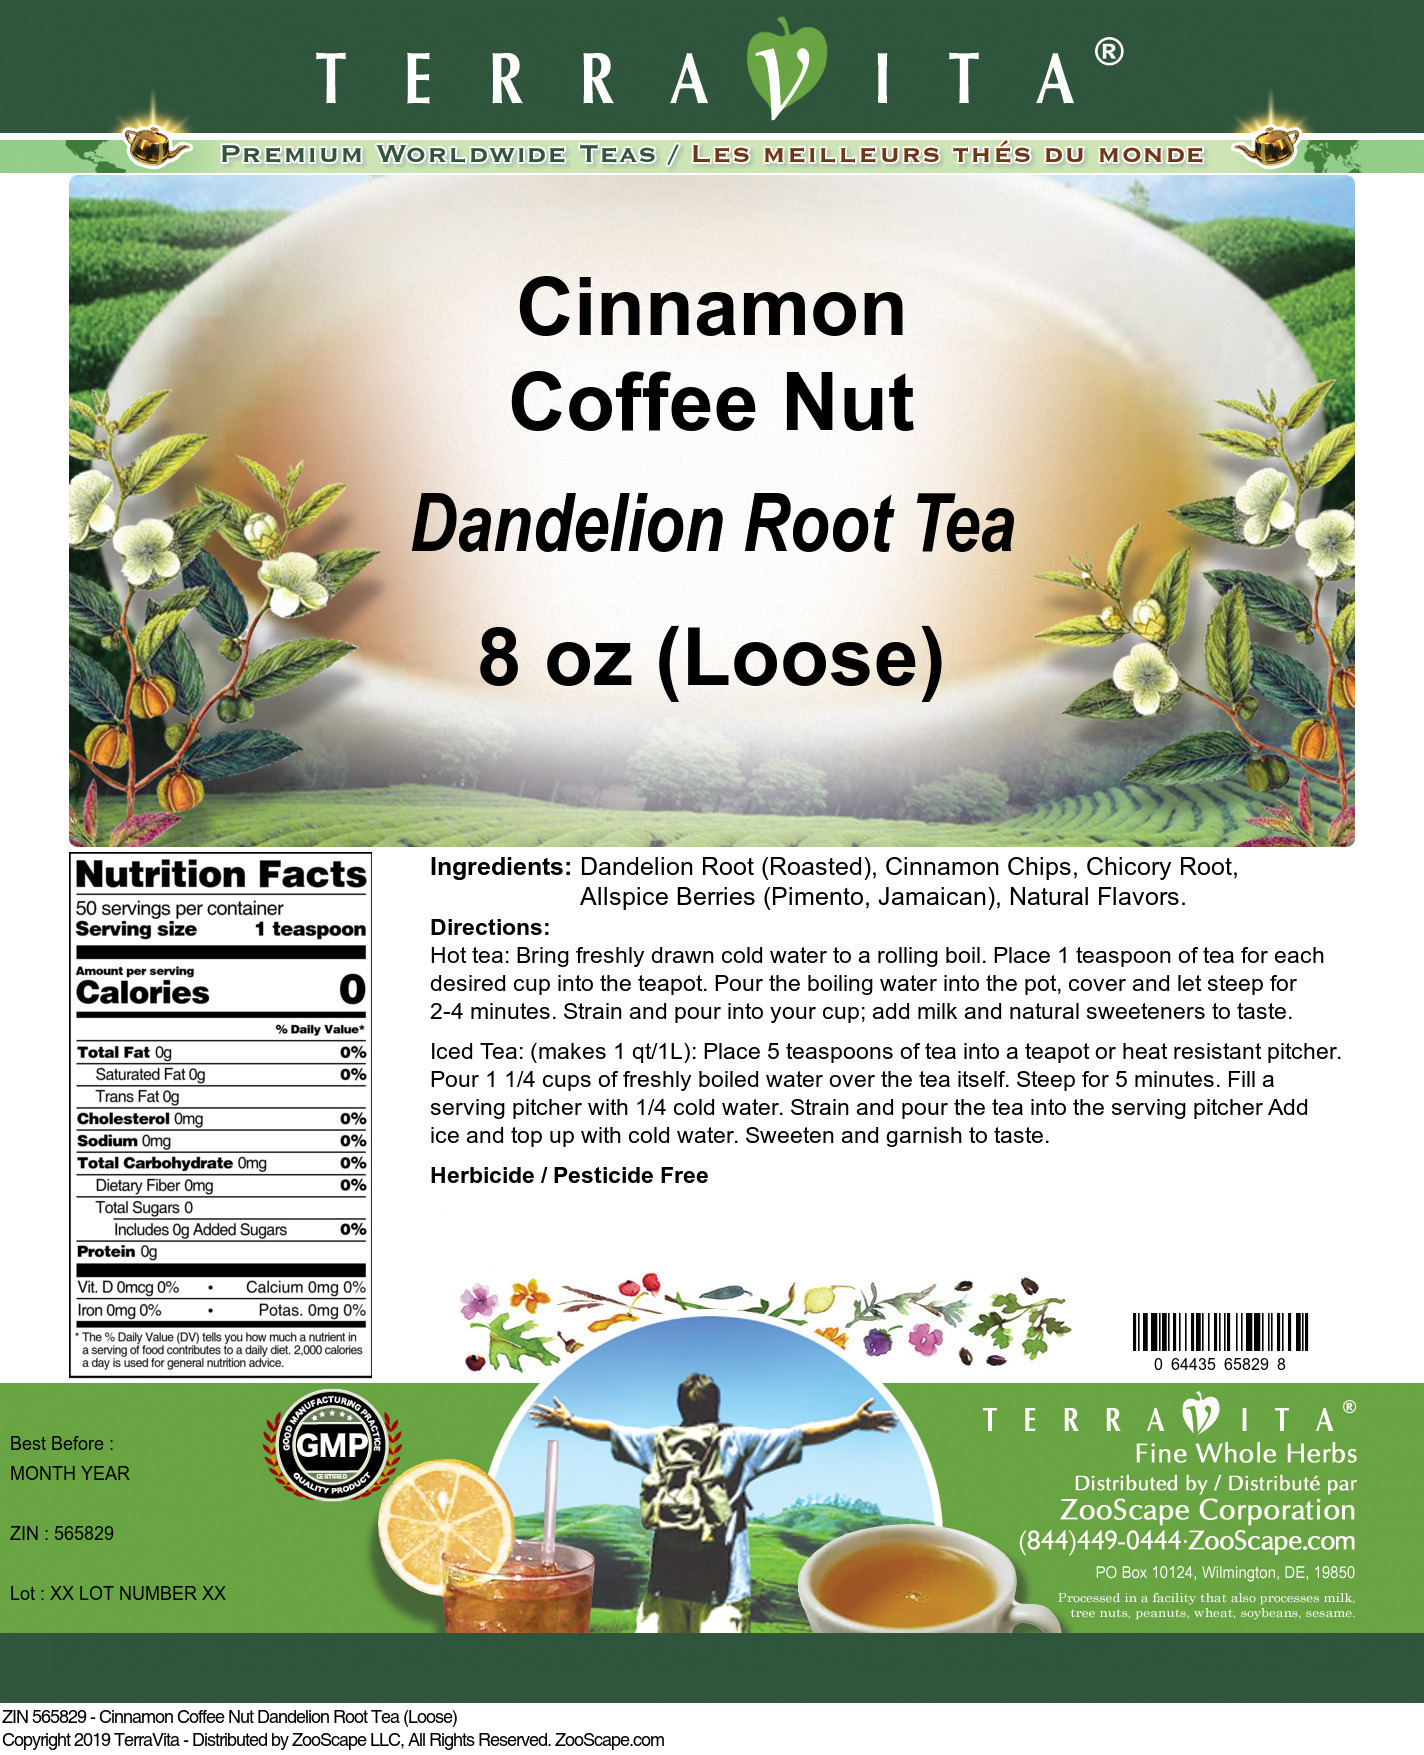 Cinnamon Coffee Nut Dandelion Root